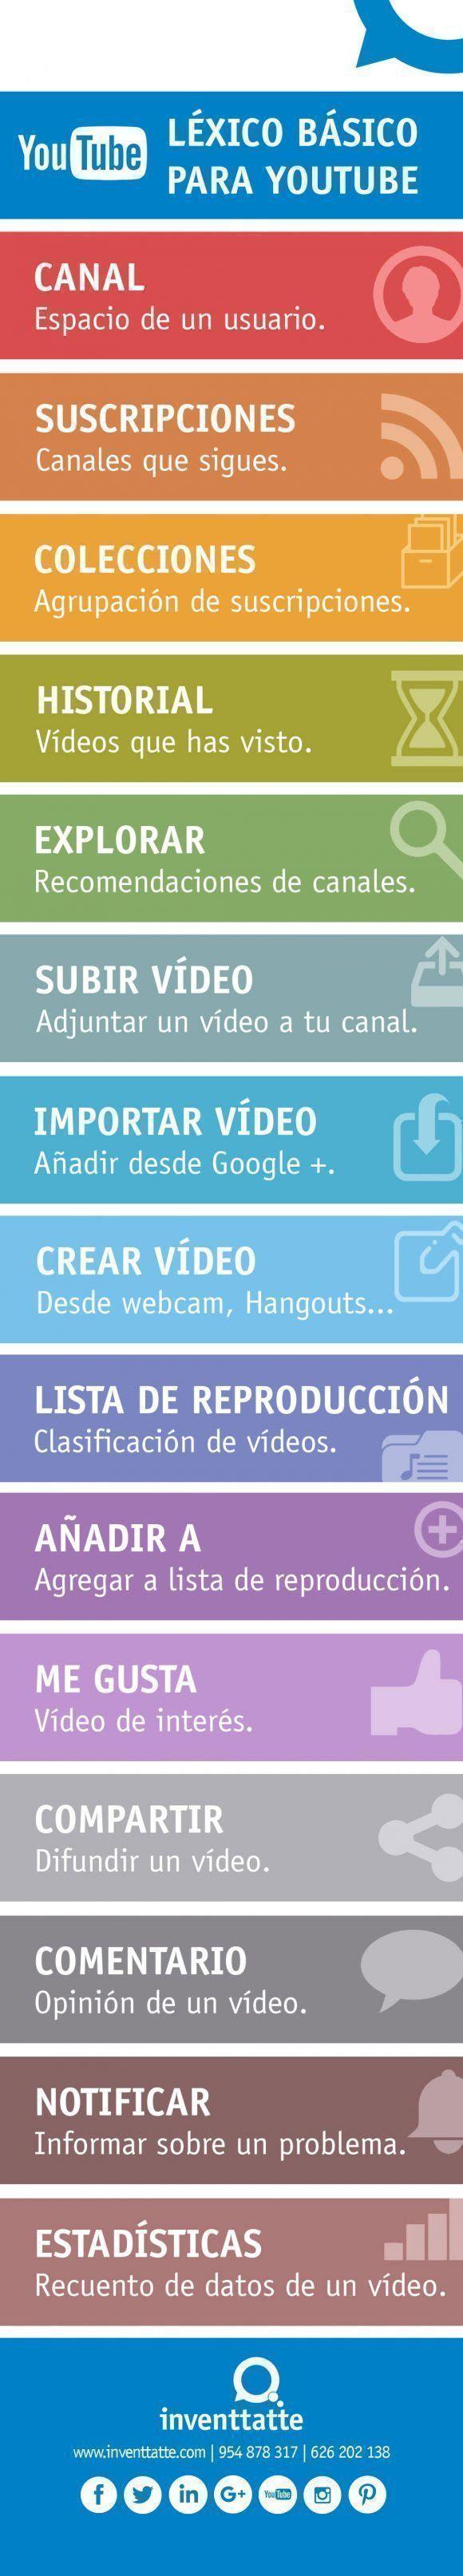 Léxico básico para Youtube. Infografía: inventtatte.com.